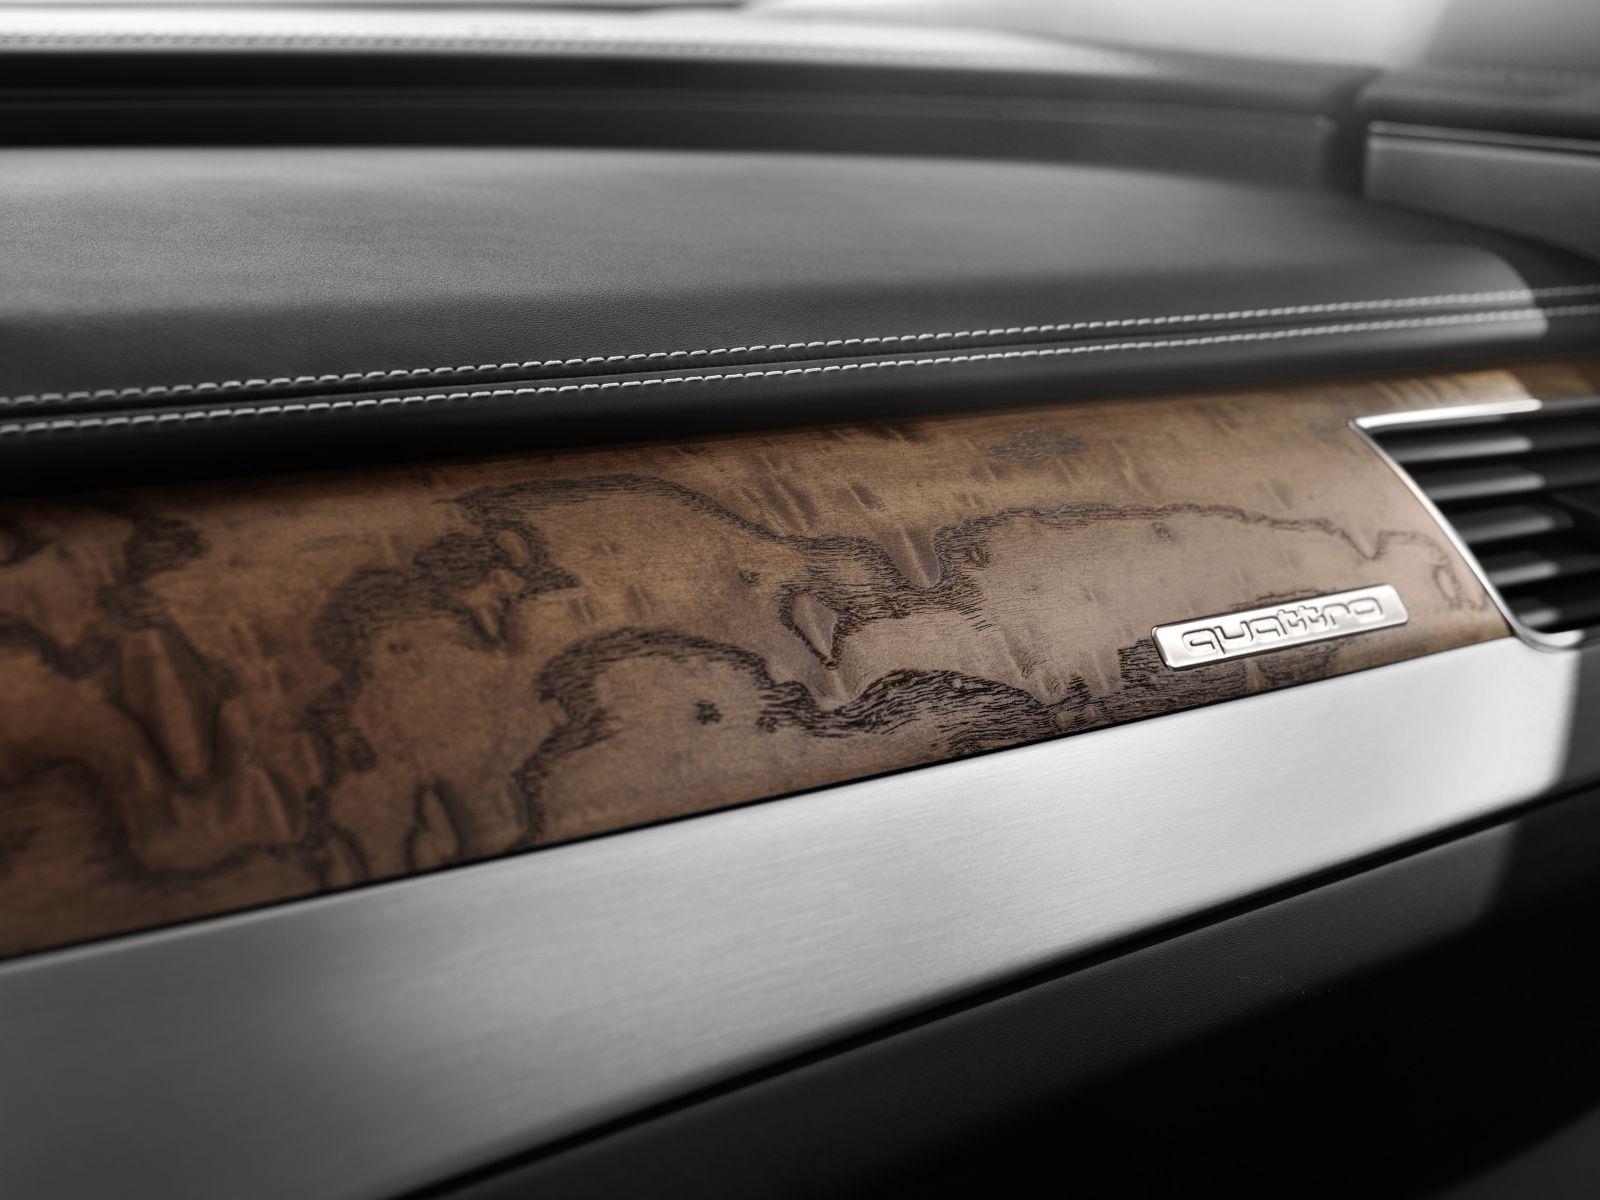 A4e Gallery Audi A8 D4 Audi A8 Exclusiv Concept